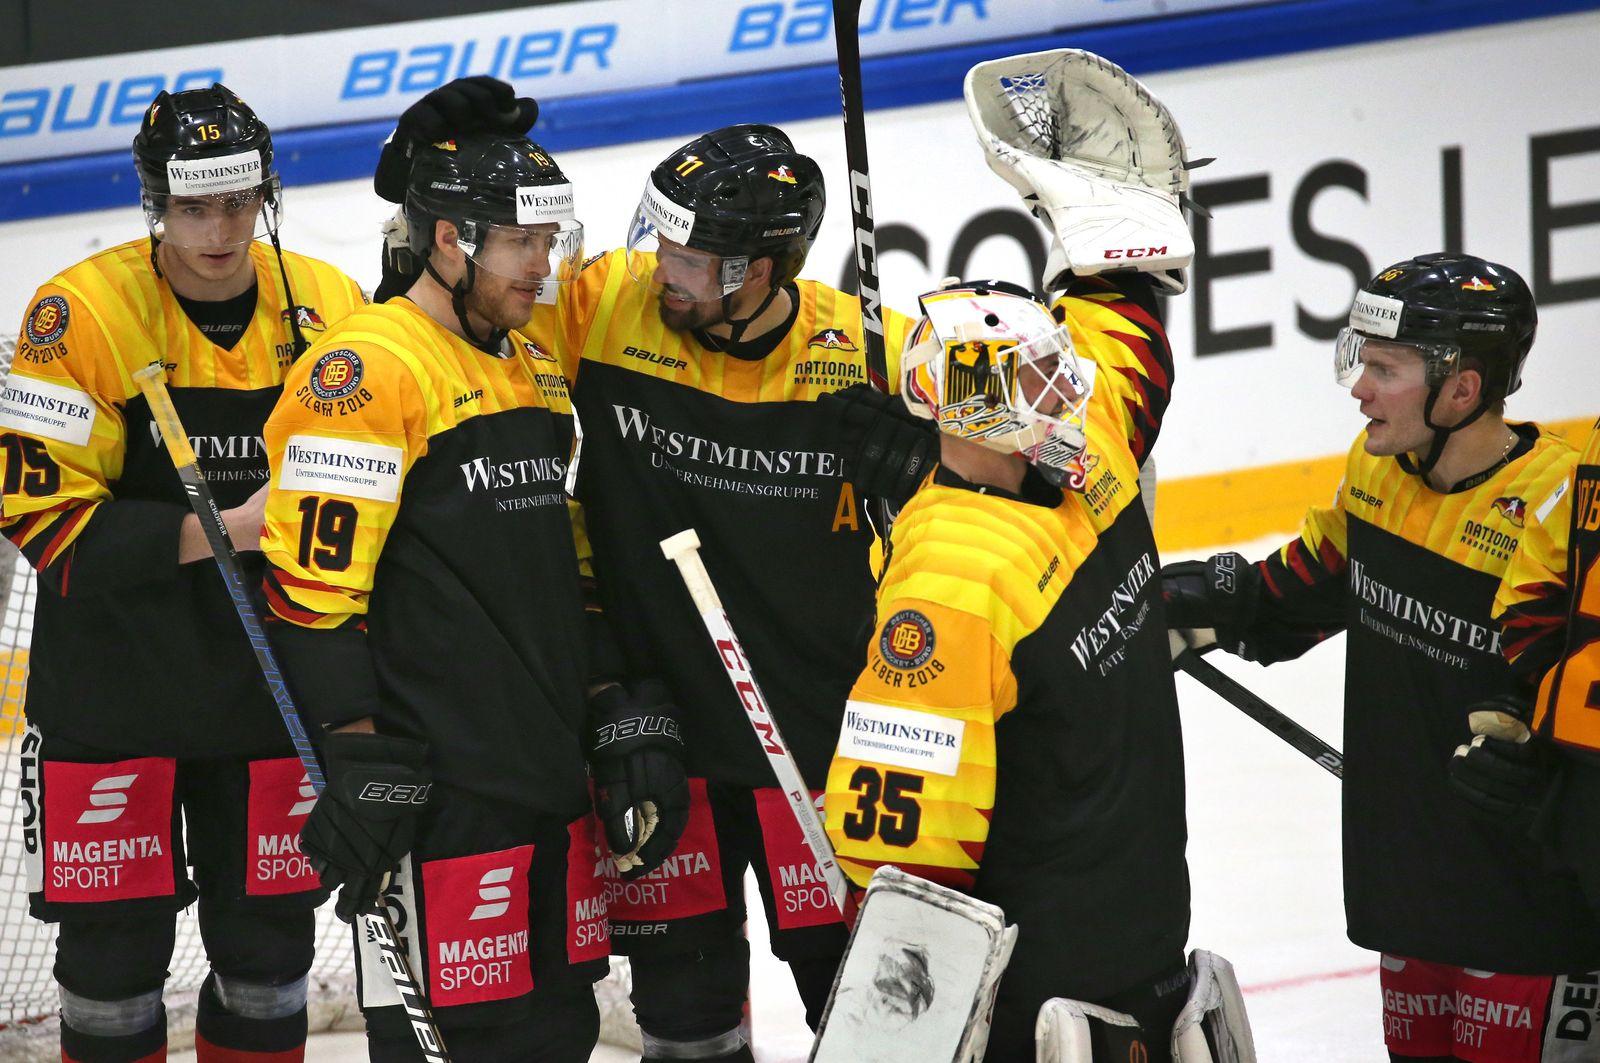 Eishockey: Deutschland - Slowakei